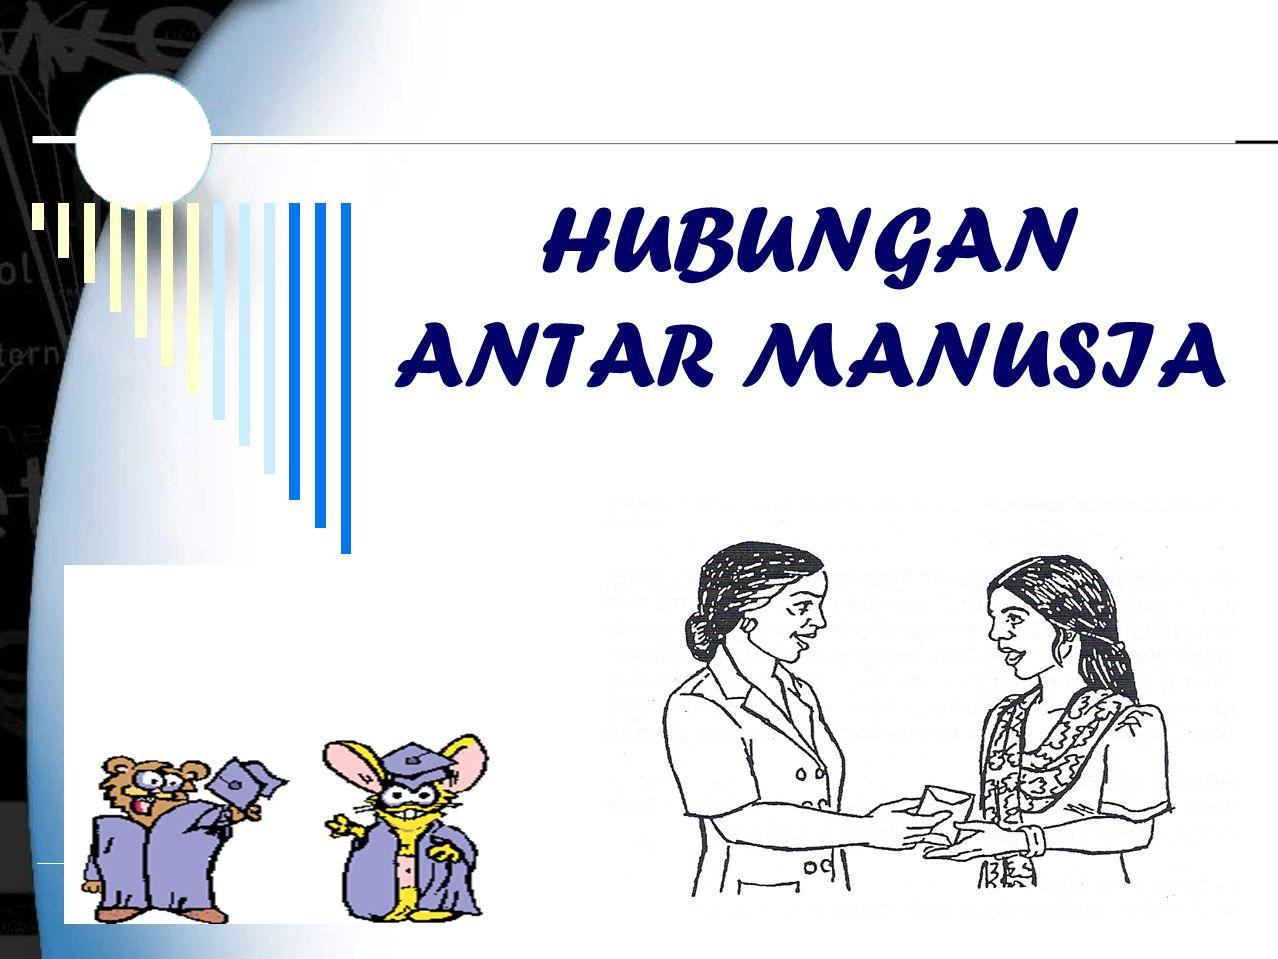 HUBUNGAN ANTAR MANUSIA